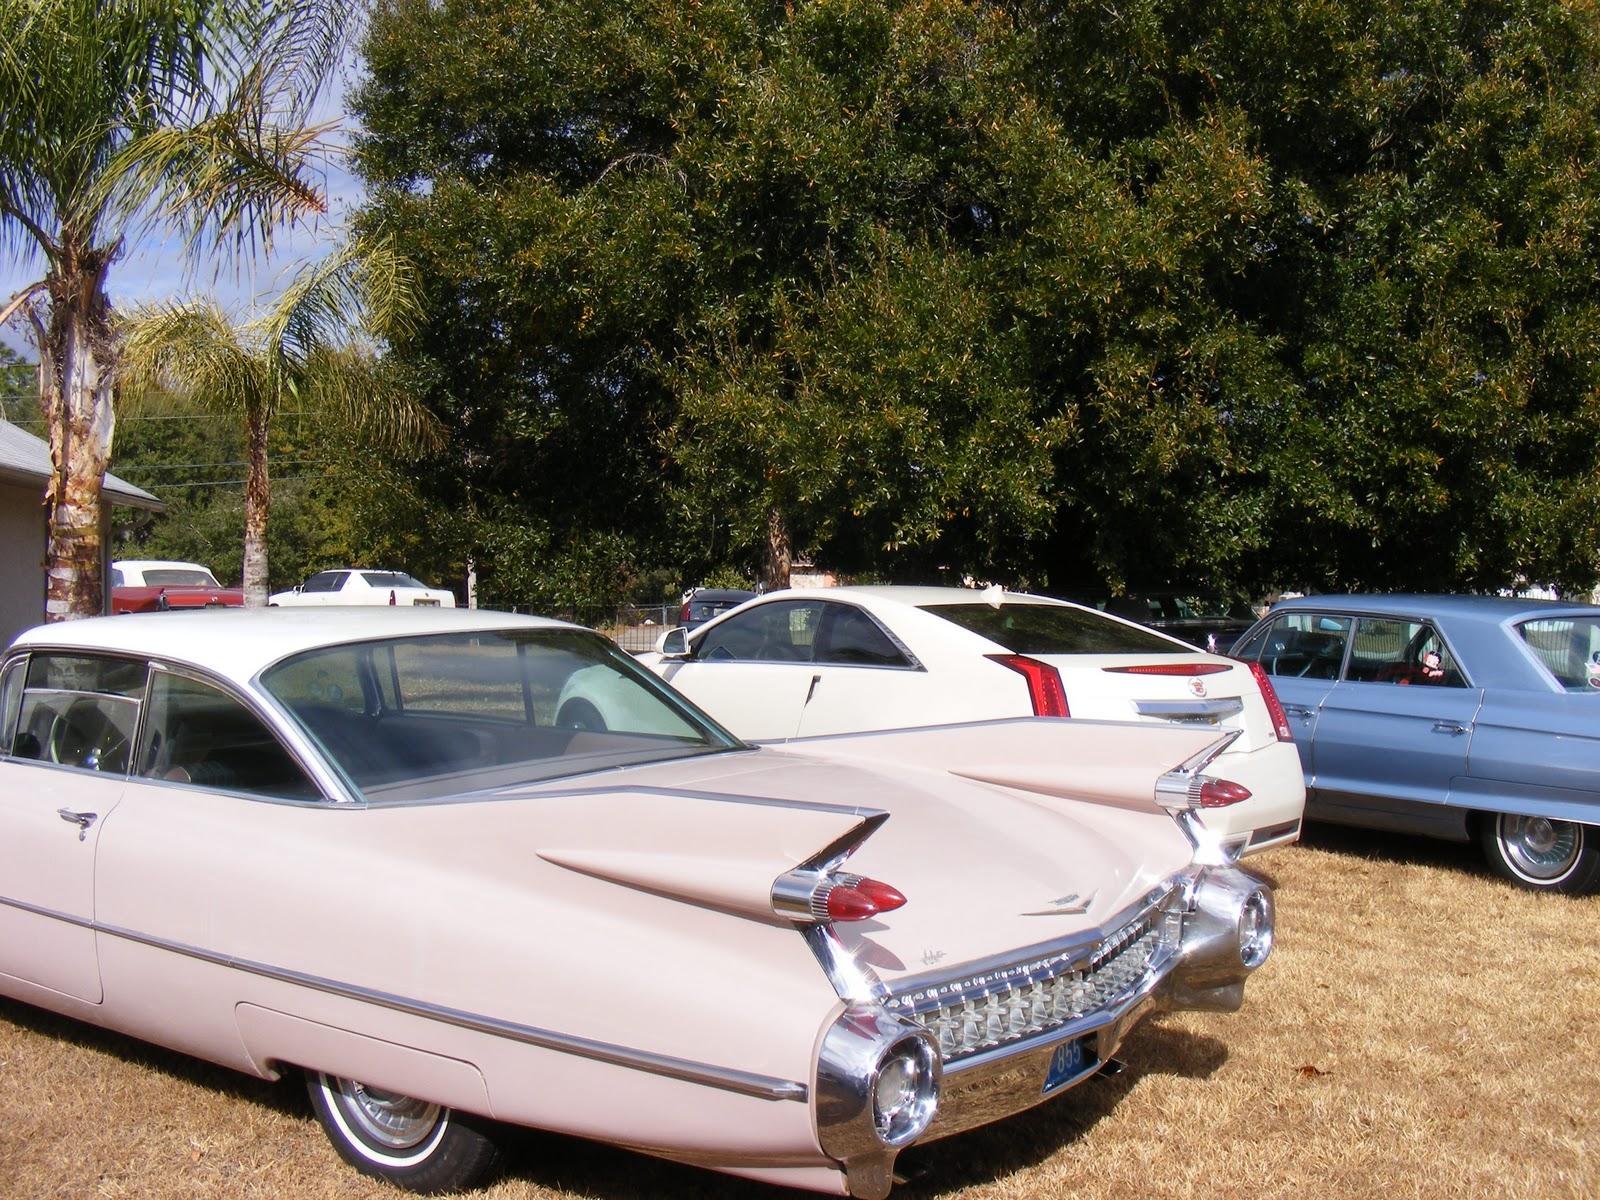 Florida Suncoast Region Cadillac LaSalle Club: December 2010